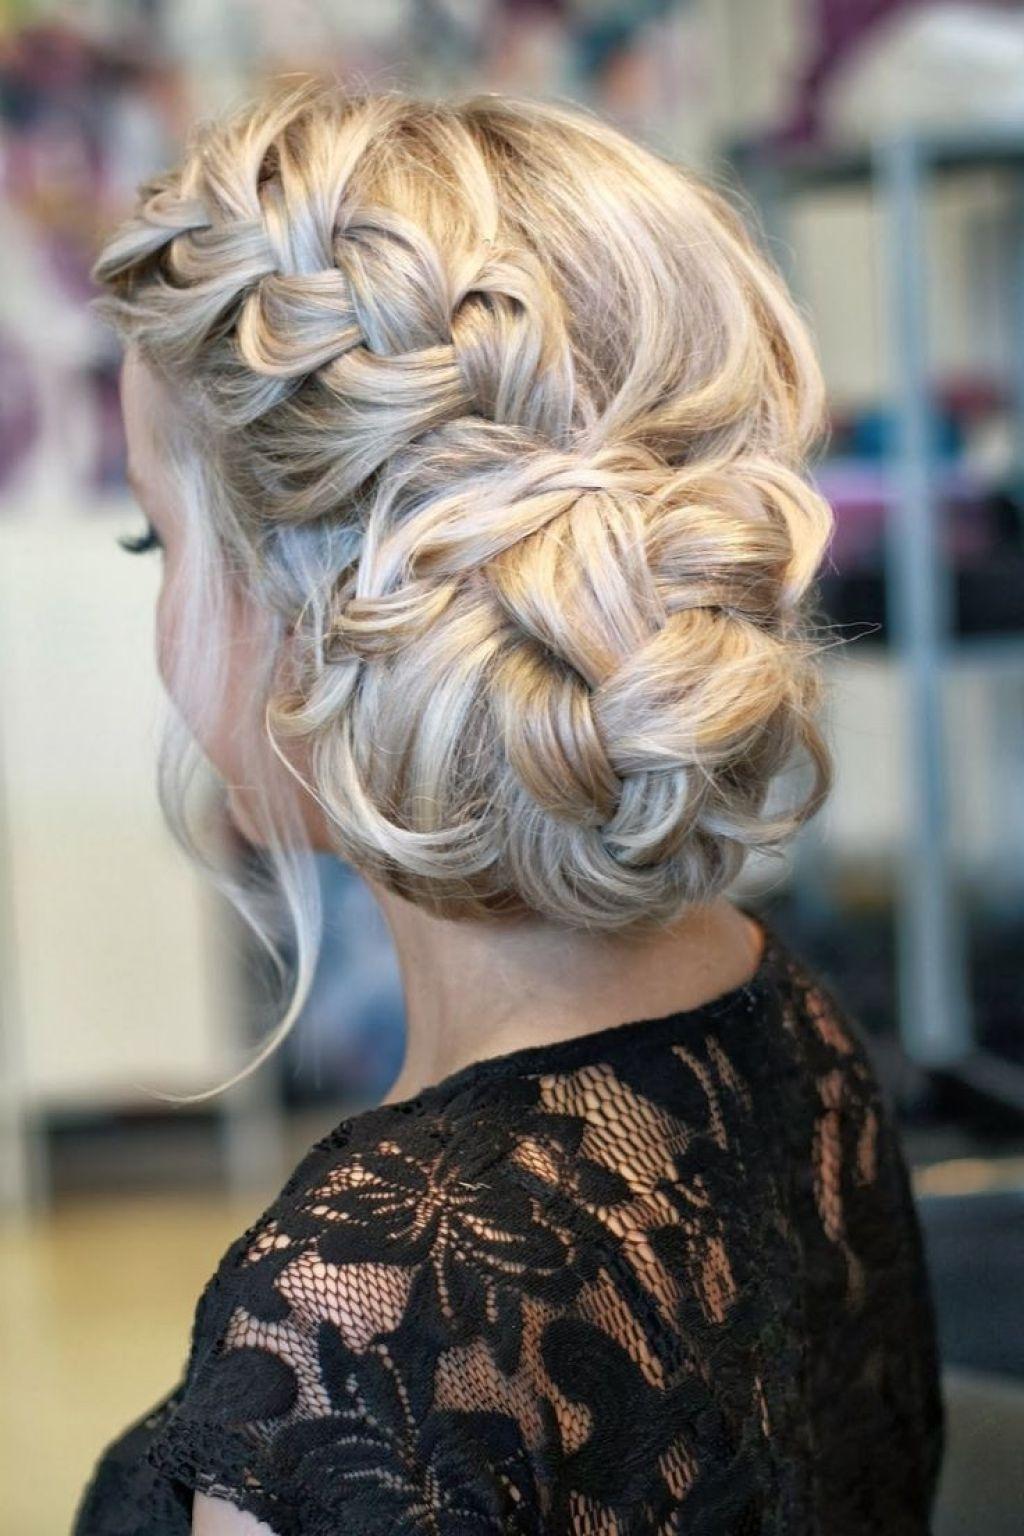 Formal dance hairstyles hairstyles pinterest dance hairstyles